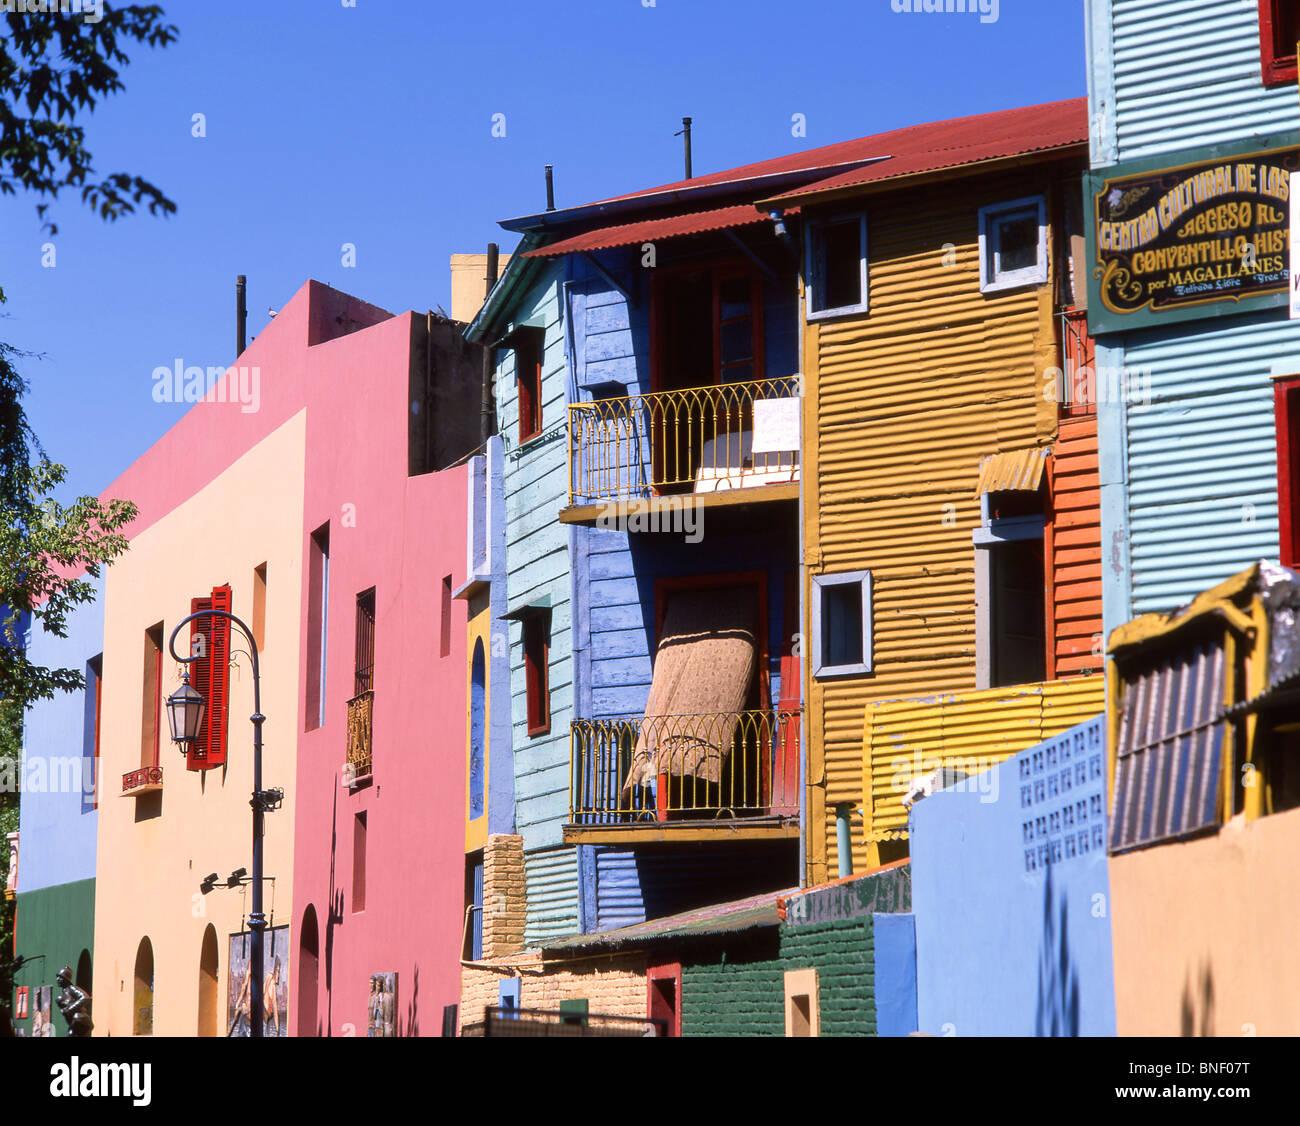 Edifícios em tons pastel, Caminito Street, La Boca, Buenos Aires, Argentina Imagens de Stock